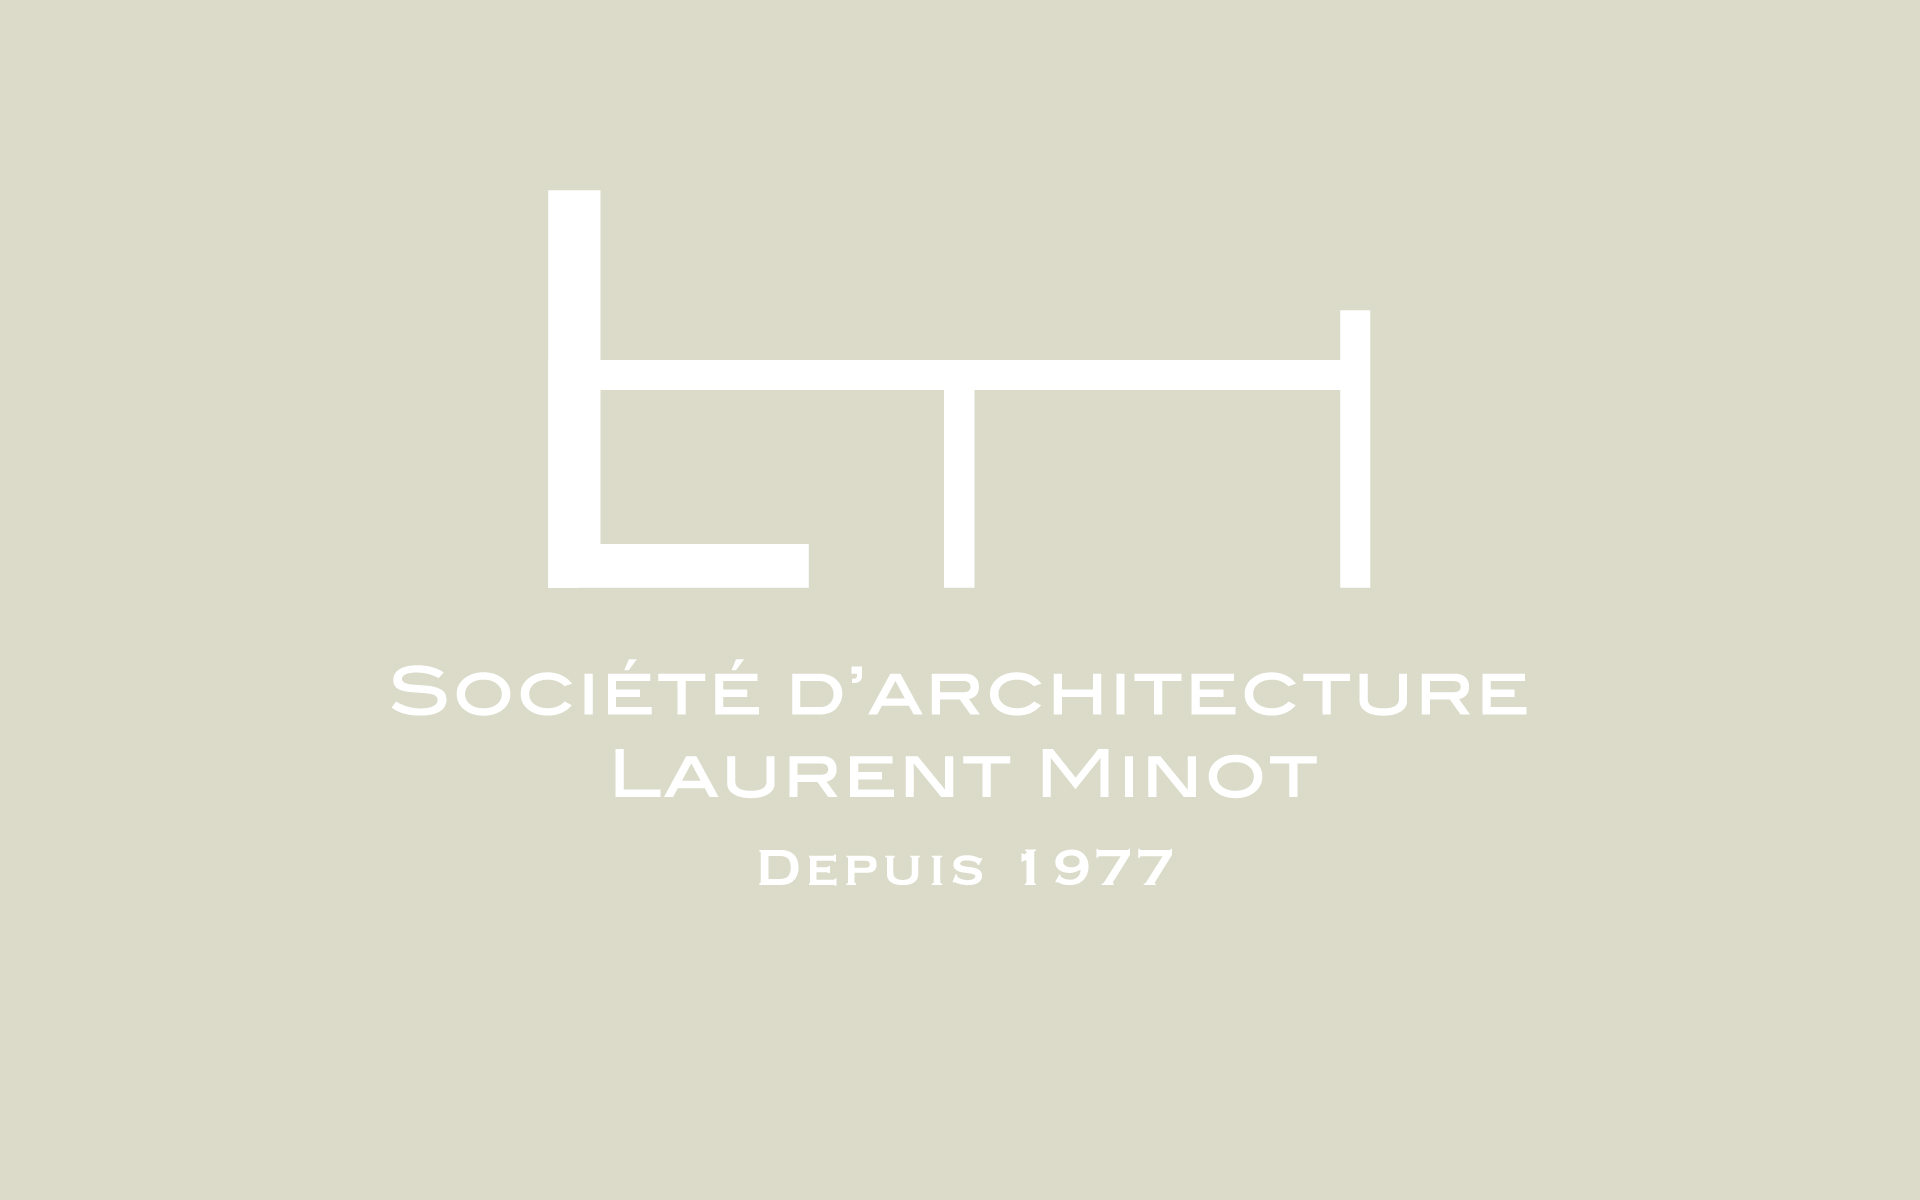 http://www.laurent-minot.com/wp-content/uploads/2014/11/Laurent-Minot-Logo.jpg